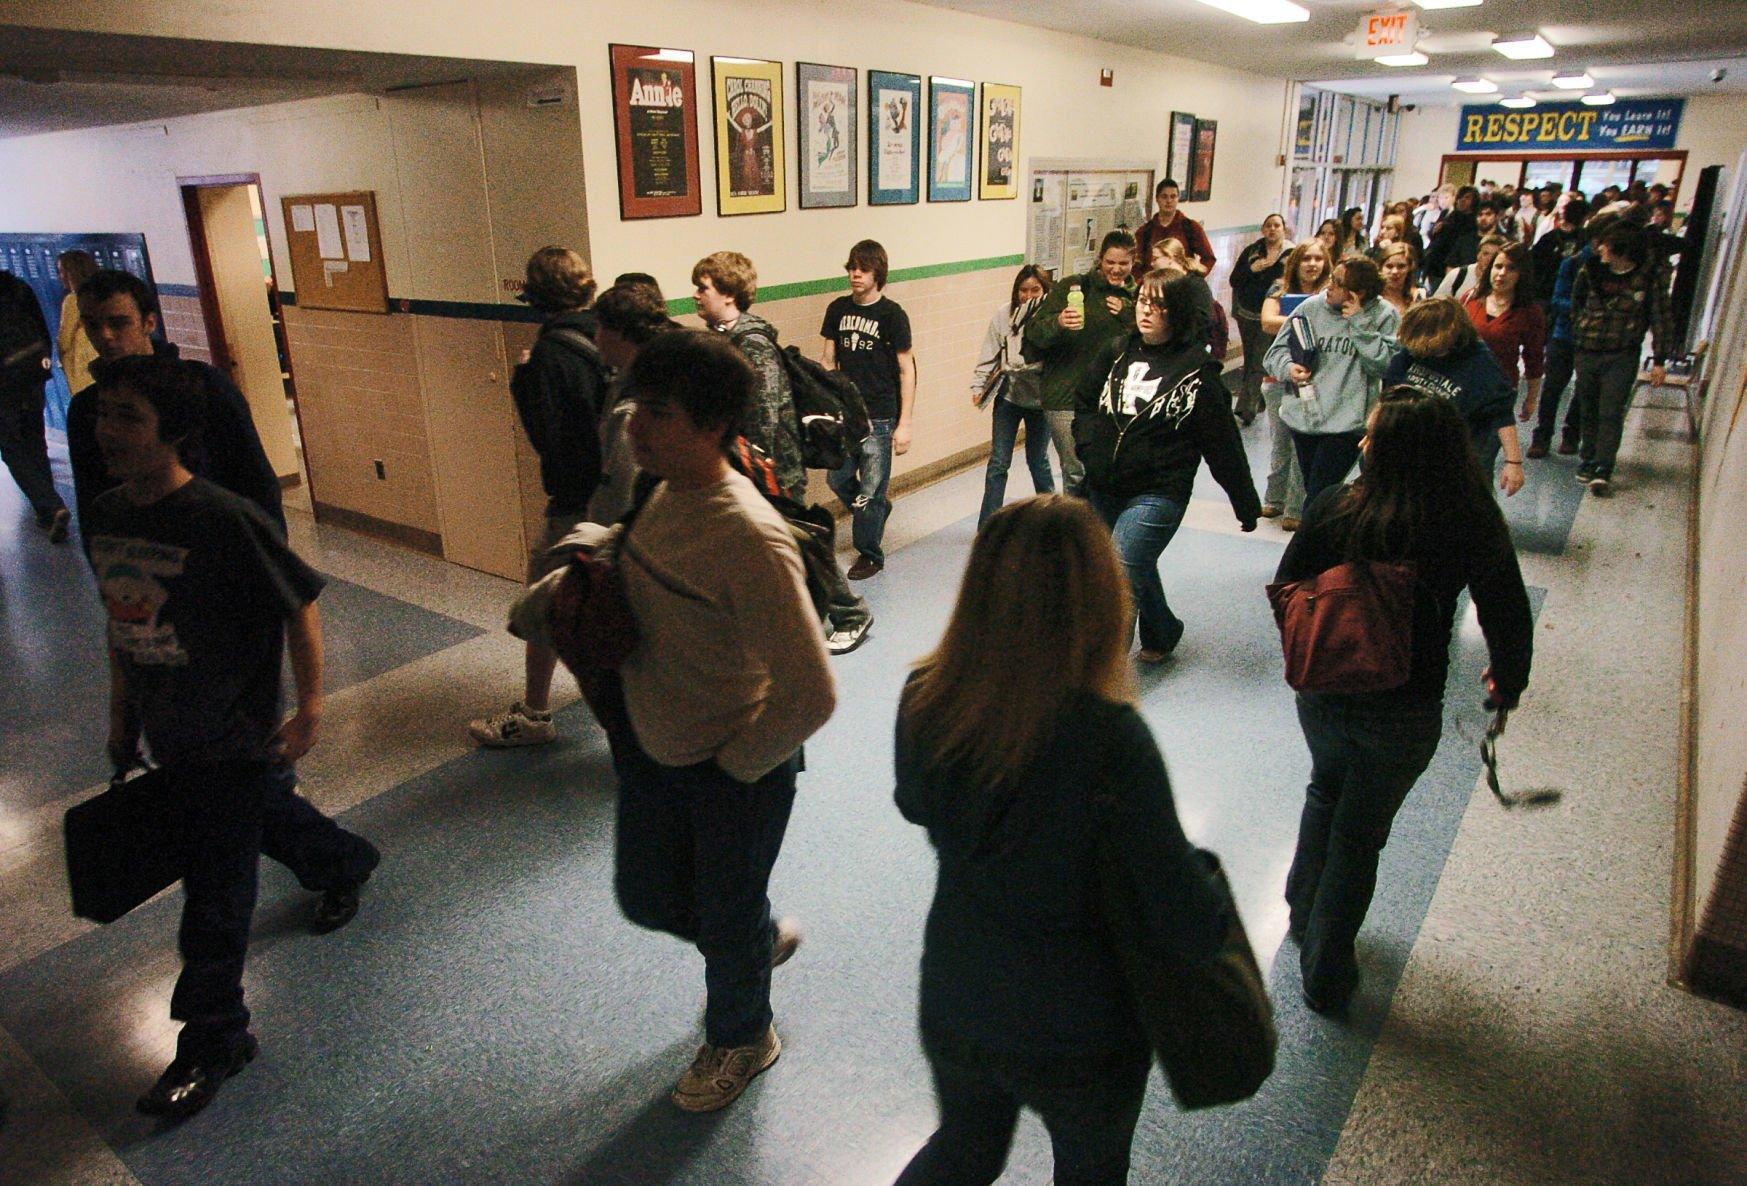 South High Enrollment down across schools